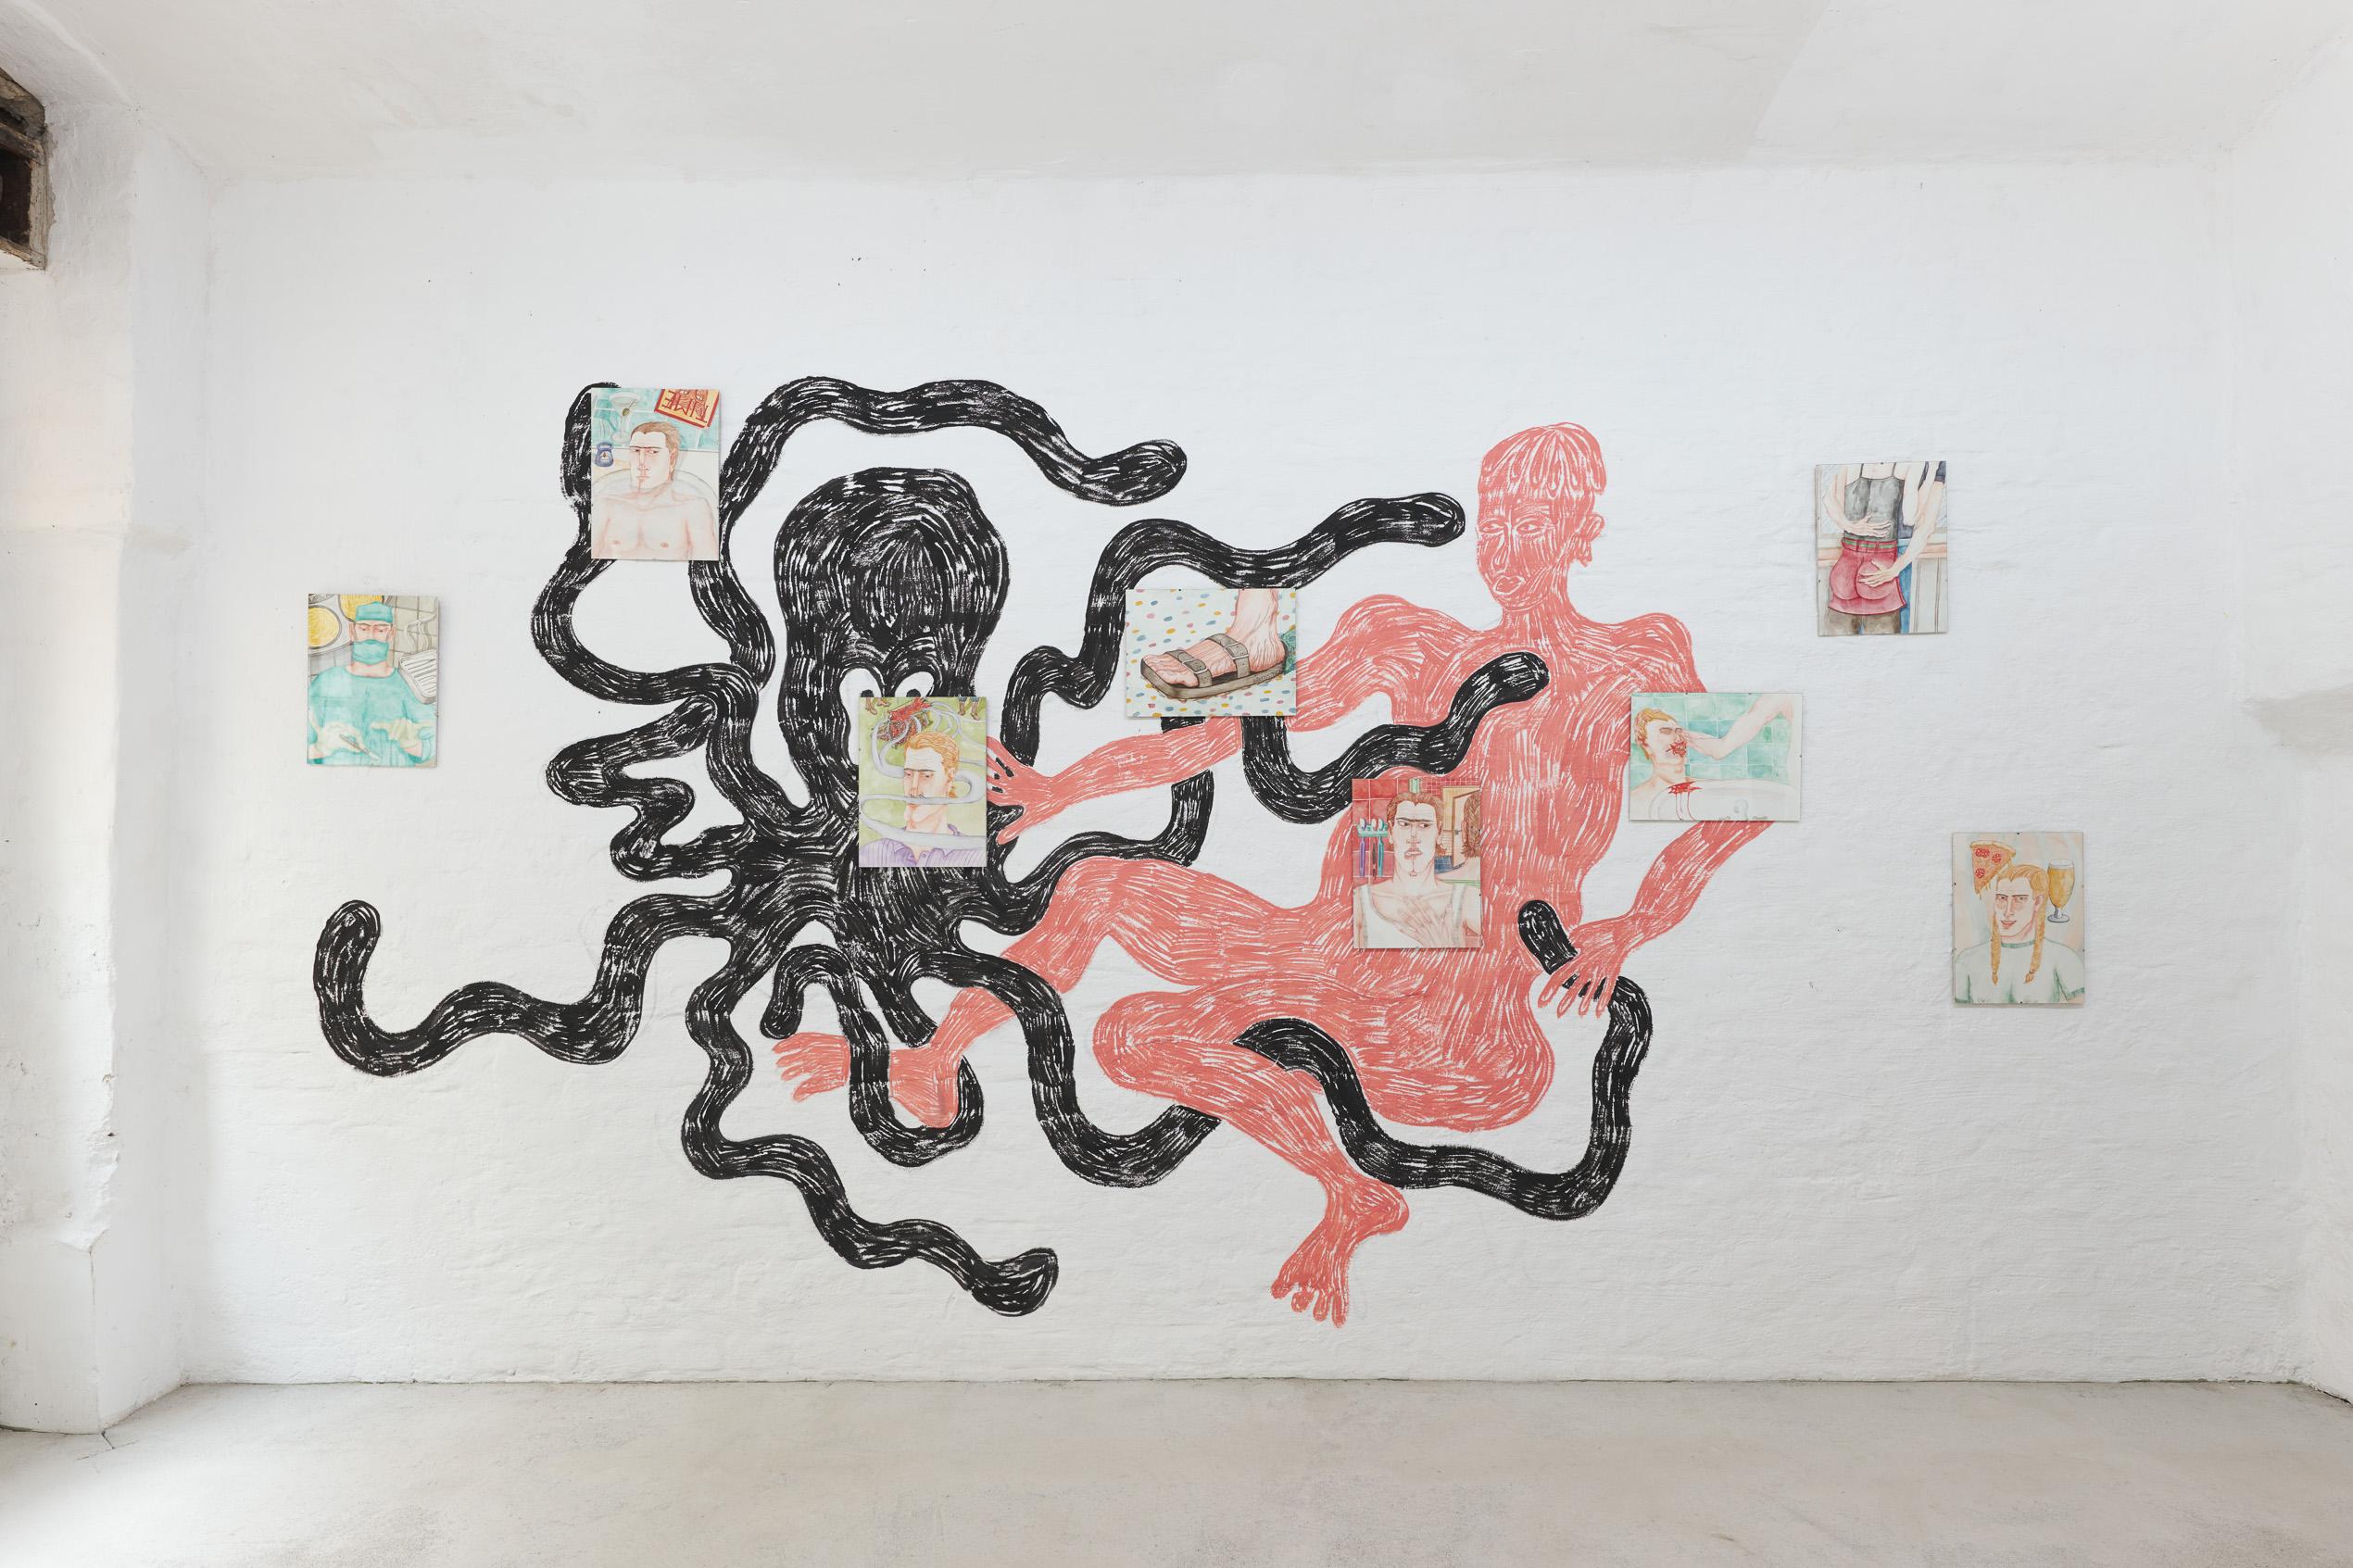 Exhibition view (Rade Petrasević, Axel Johnsson)